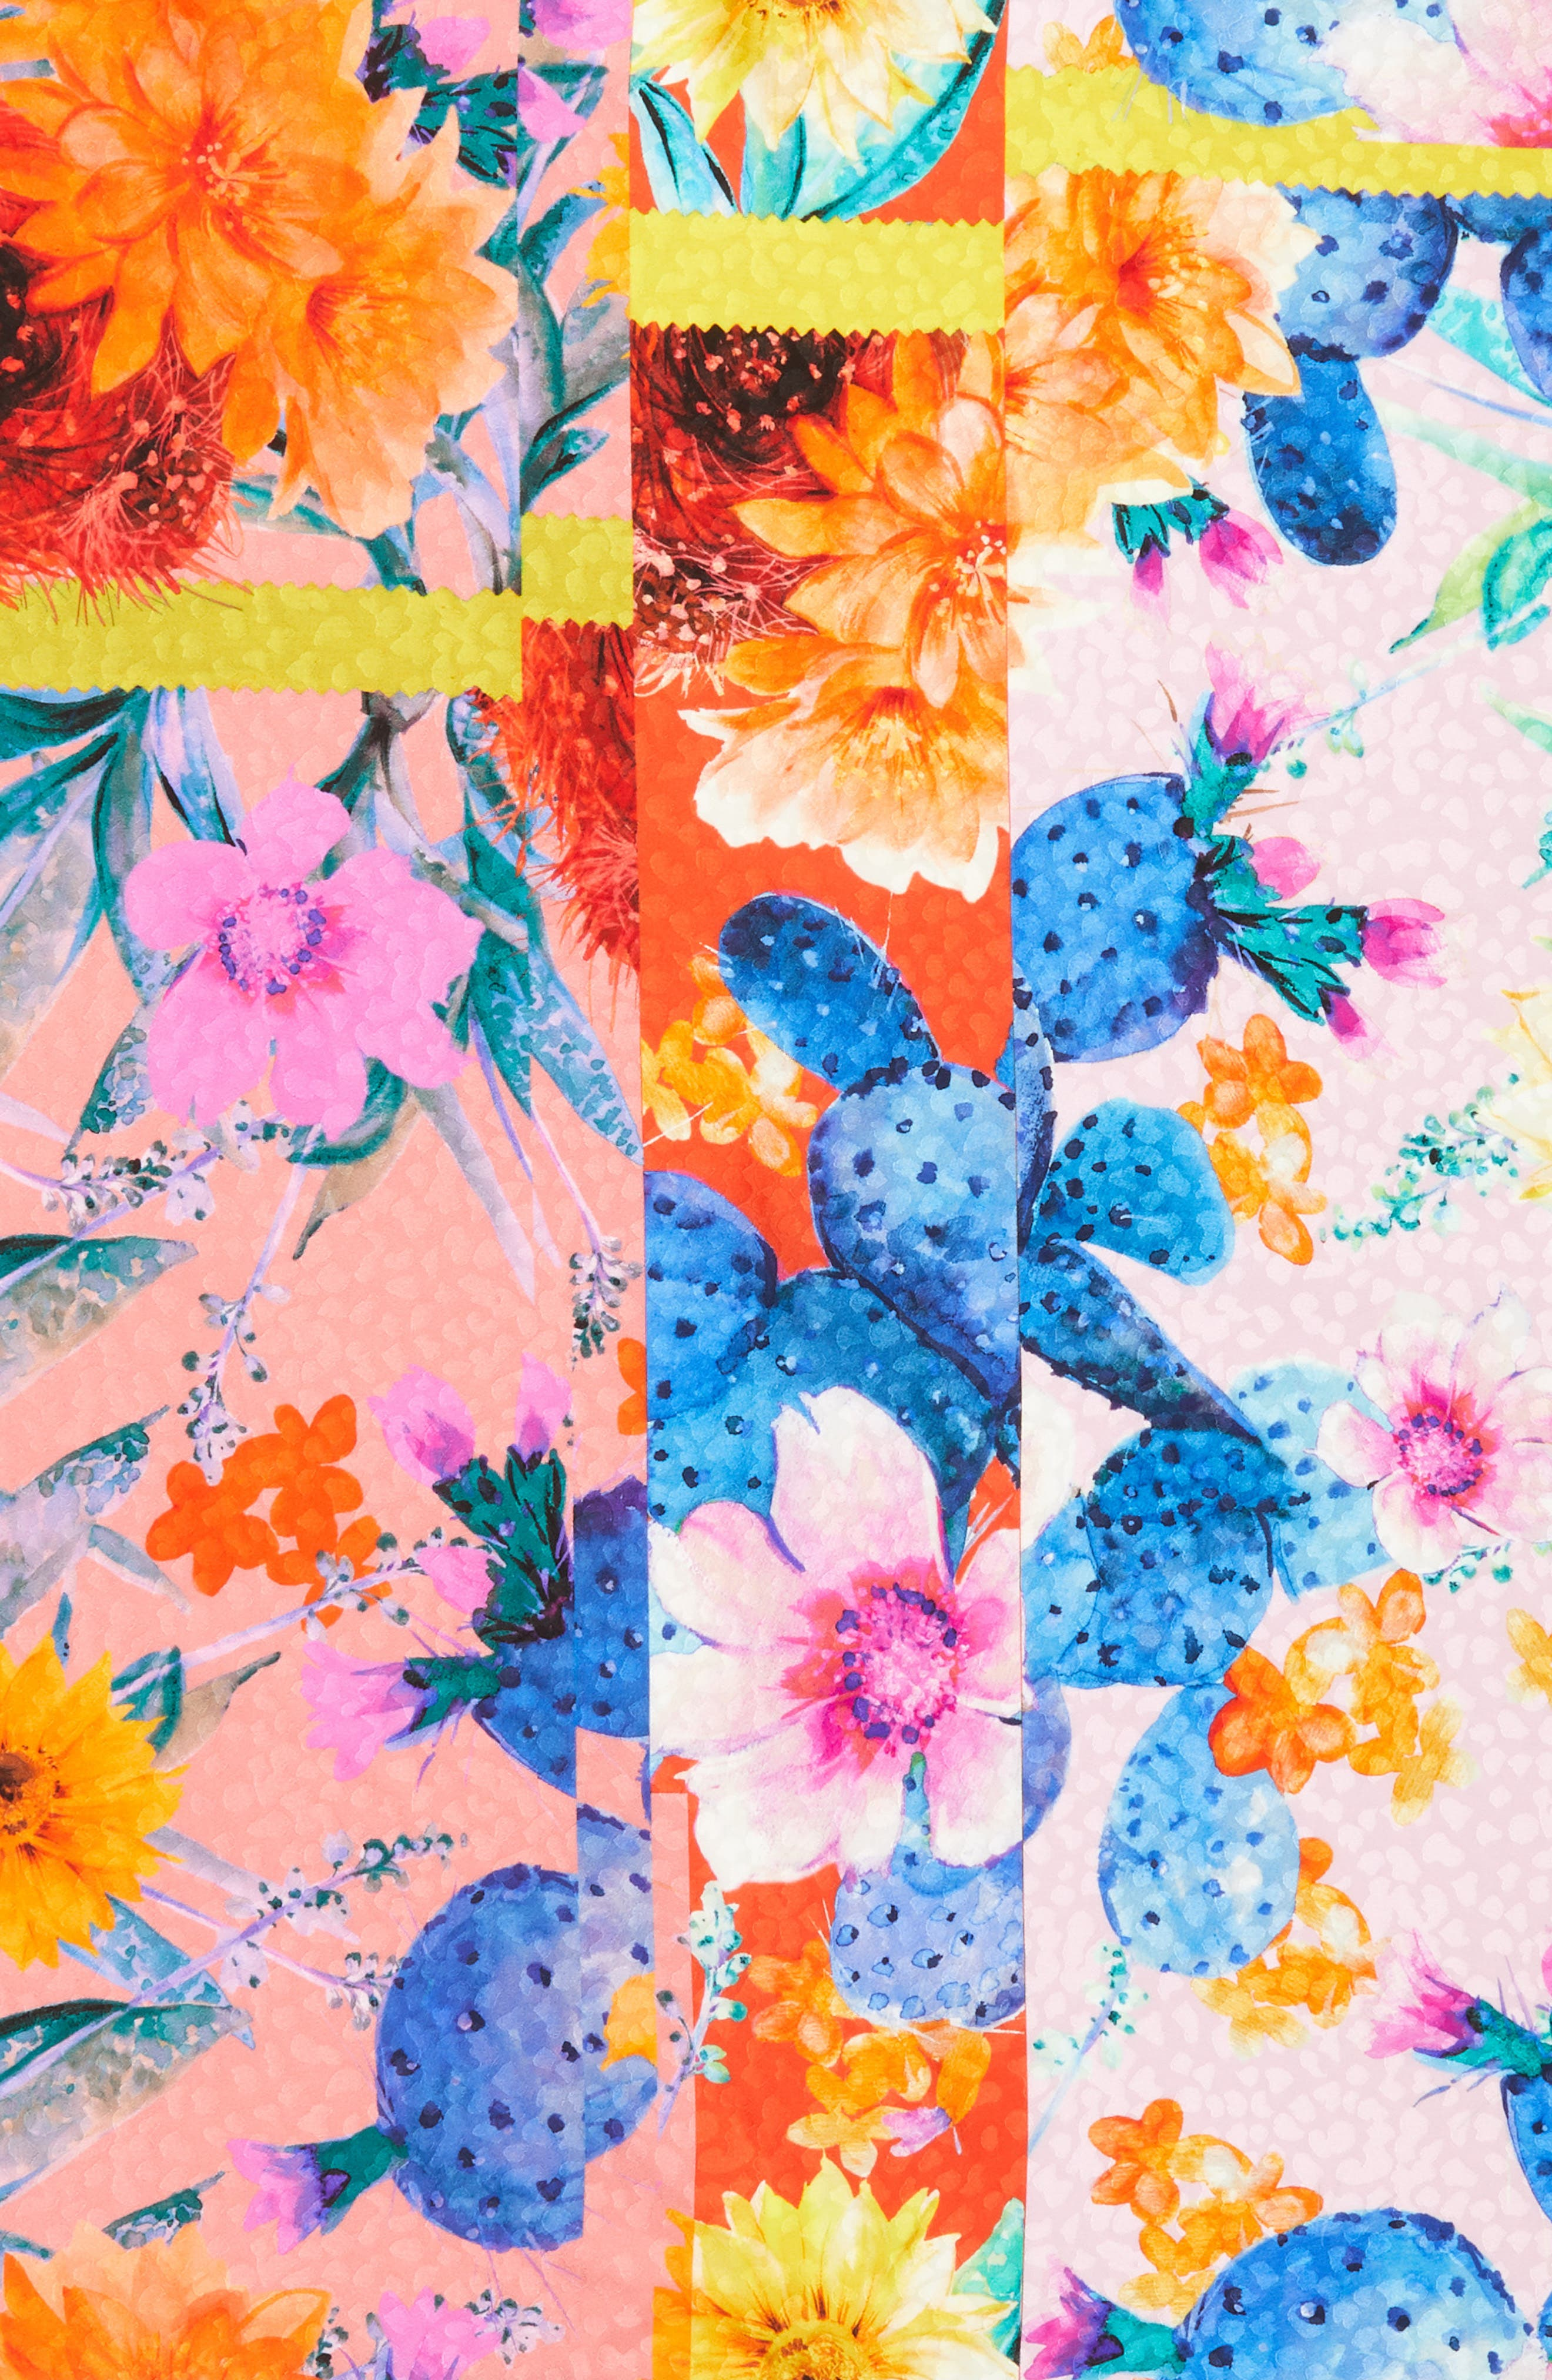 Icona del Sud Square Silk Scarf,                             Alternate thumbnail 4, color,                             CORAL RED/ BLUE